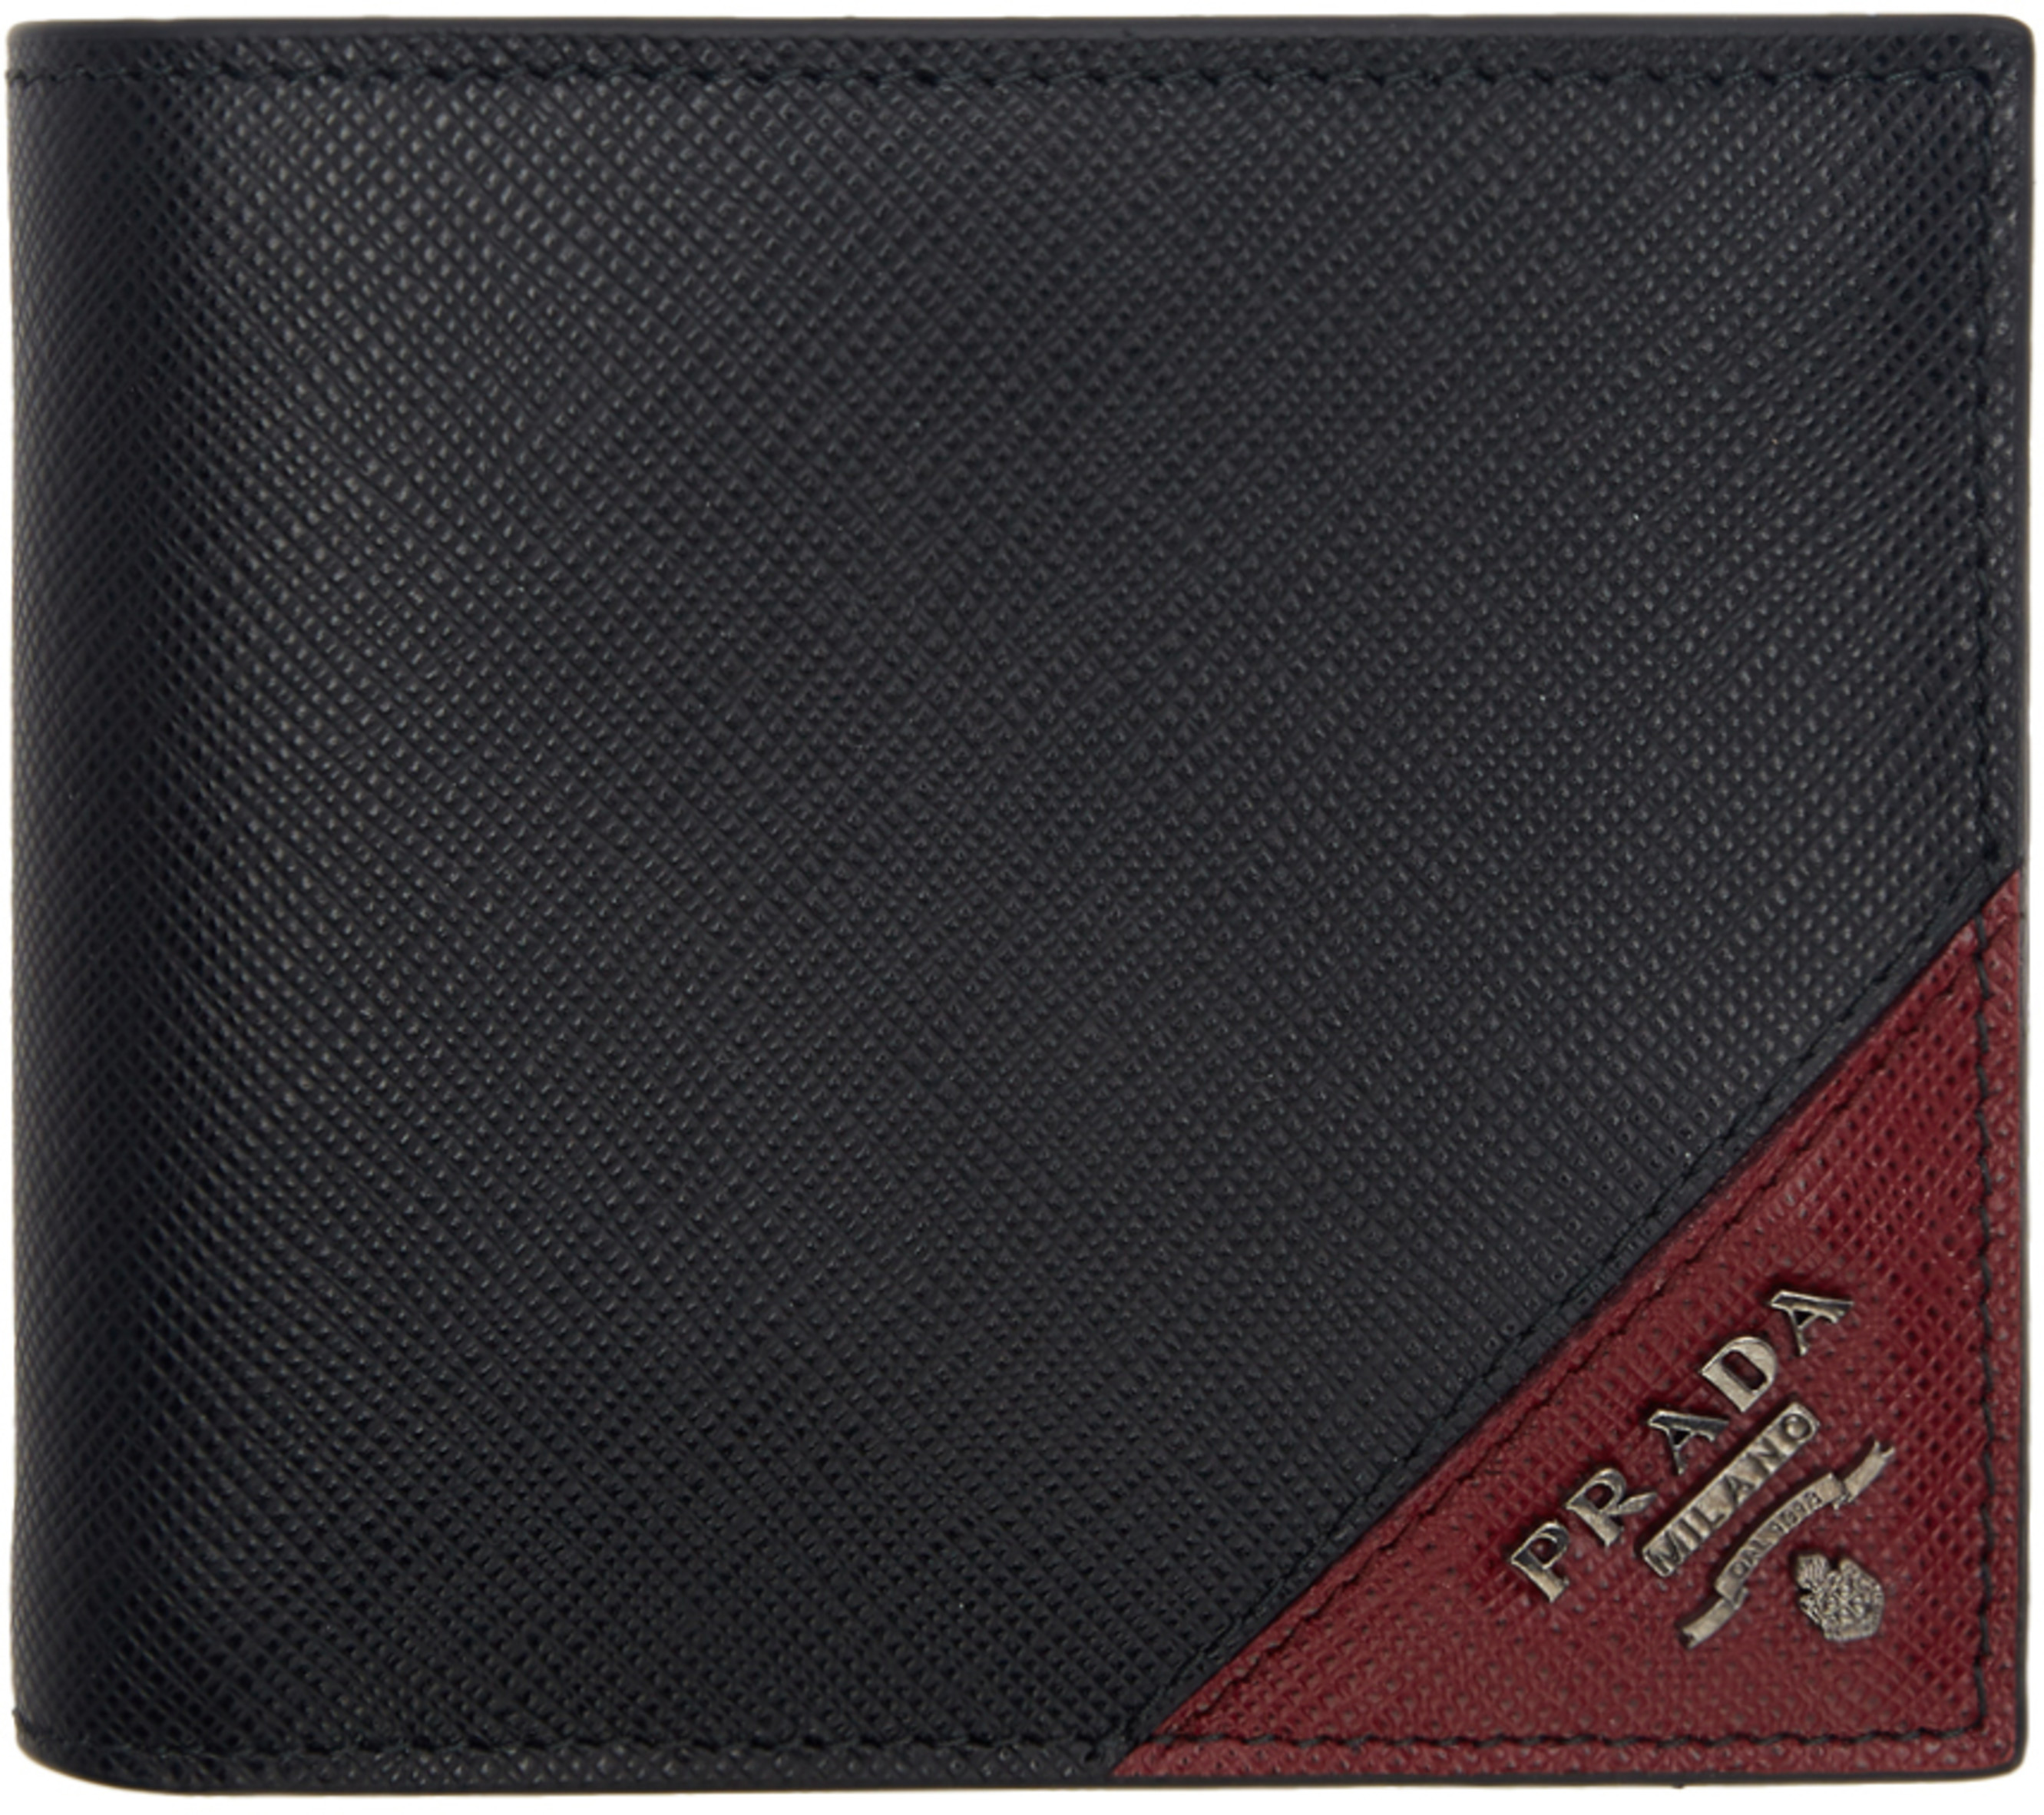 eab4169de4ff Prada wallets & card holders for Men | SSENSE Canada